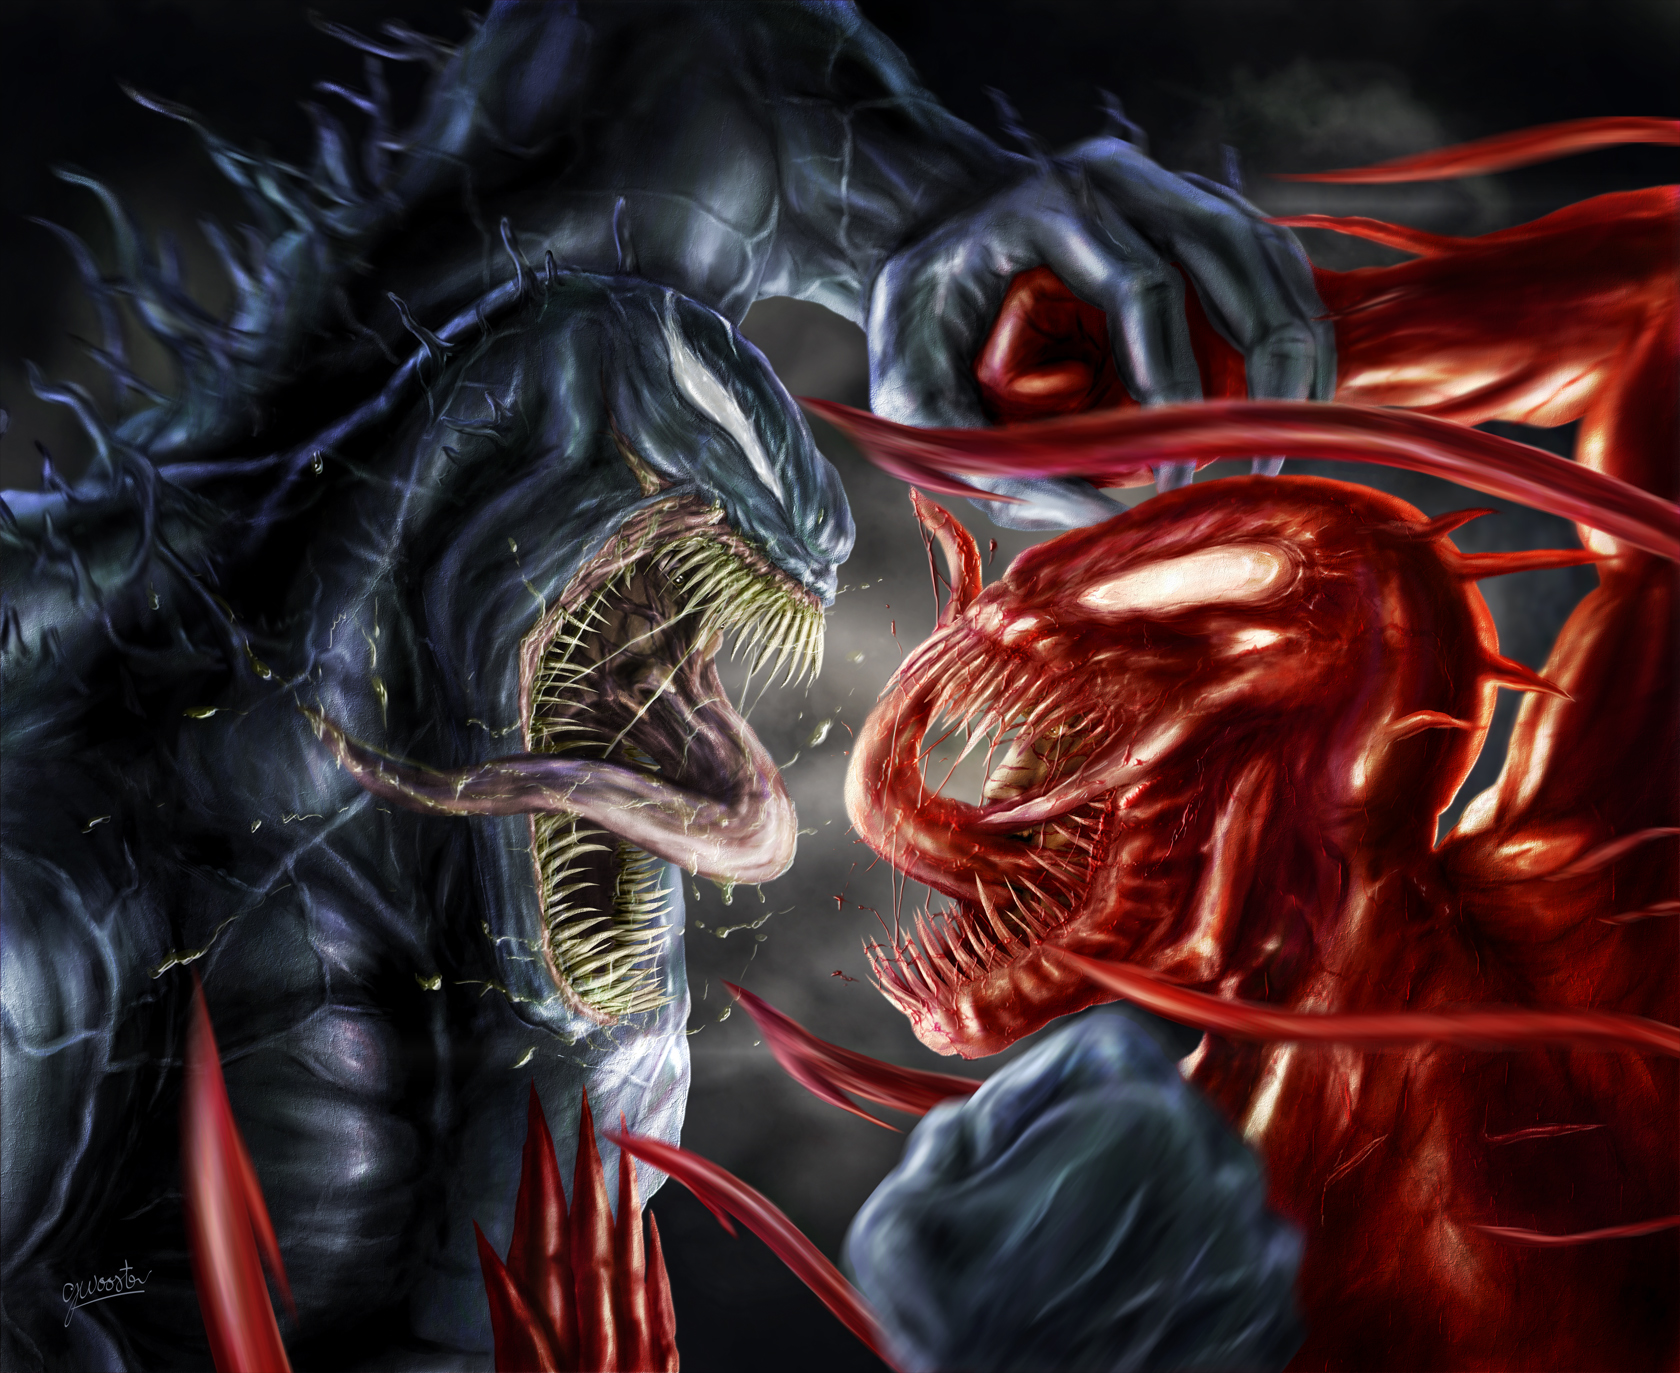 Venom Vs Carnage by DISENT 1680x1373